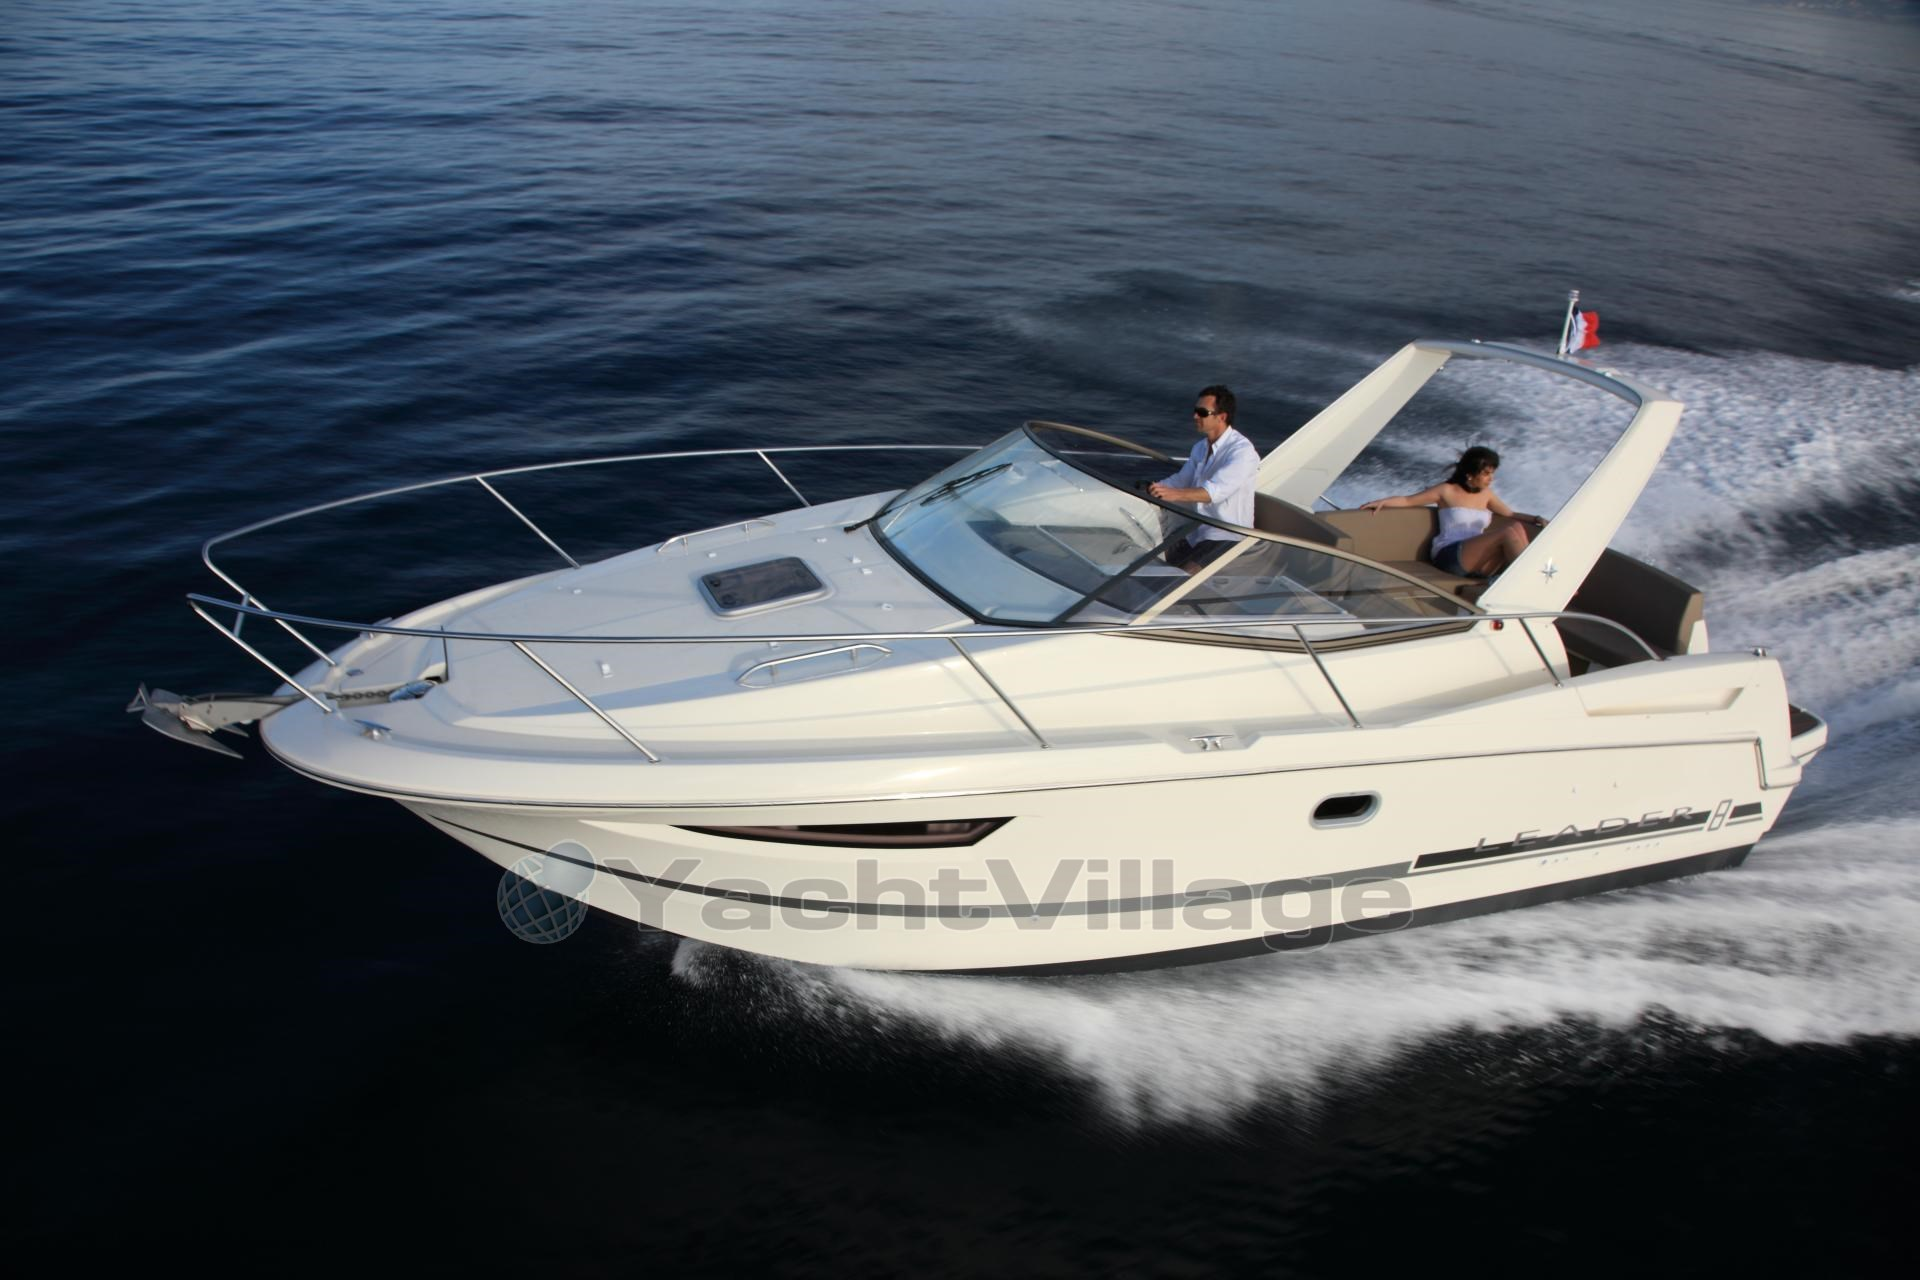 jeanneau leader 8 bateau moteur occasion en vente en. Black Bedroom Furniture Sets. Home Design Ideas